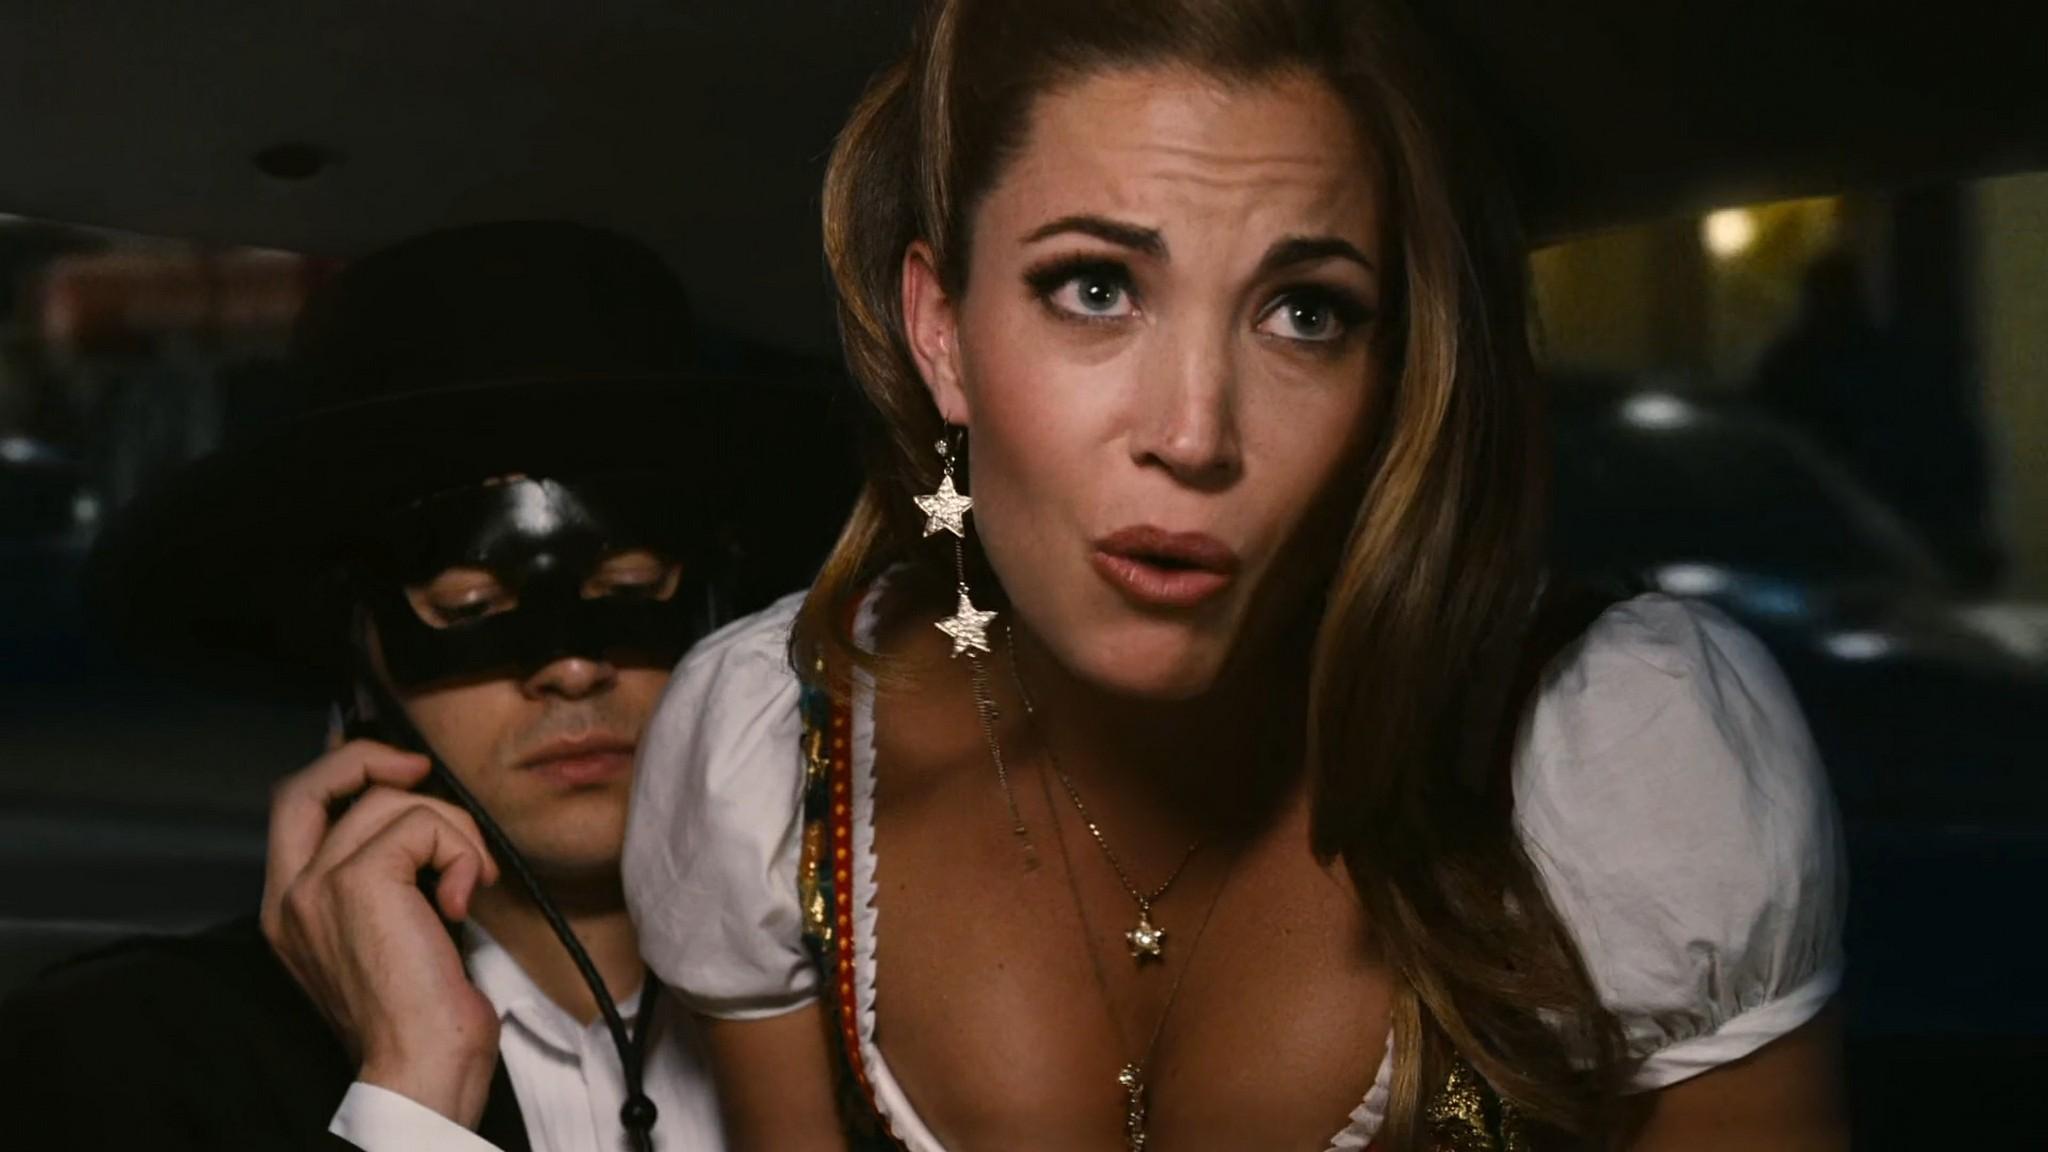 Danneel Ackles nude Carmen Electra, Arielle Kebbel, sexy otherrs nude and hot - Mardi Gras: Spring Break (2011) HD 1080p WEb (6)